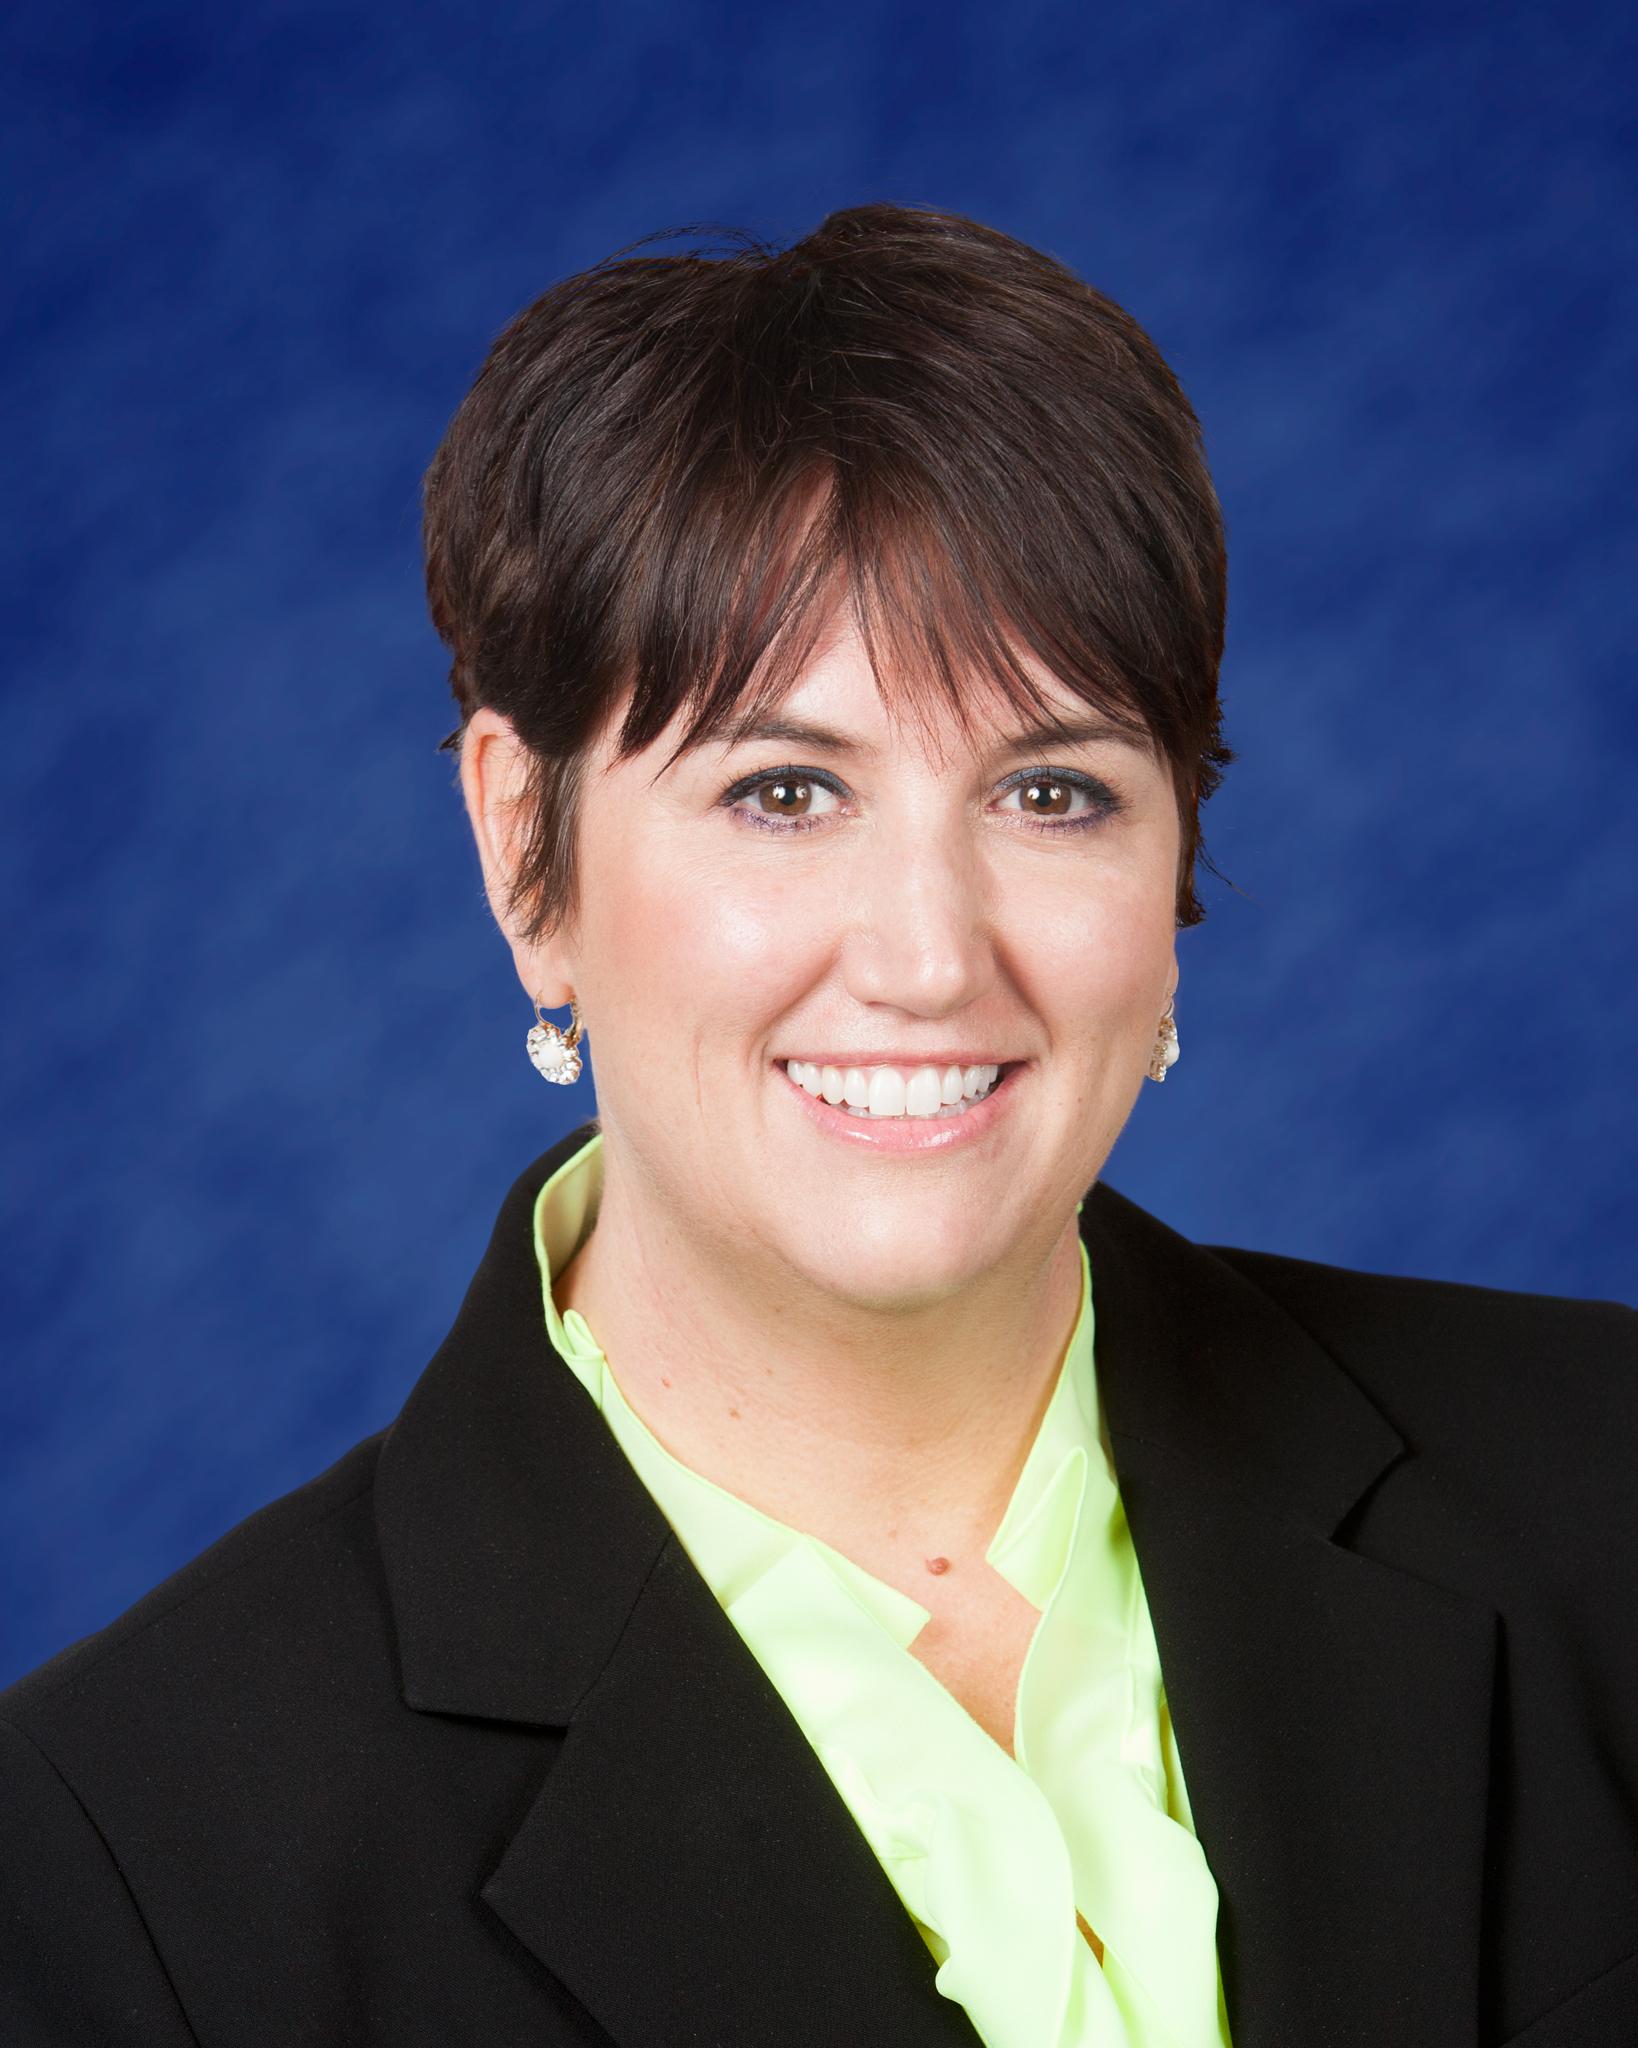 Kelly Munson